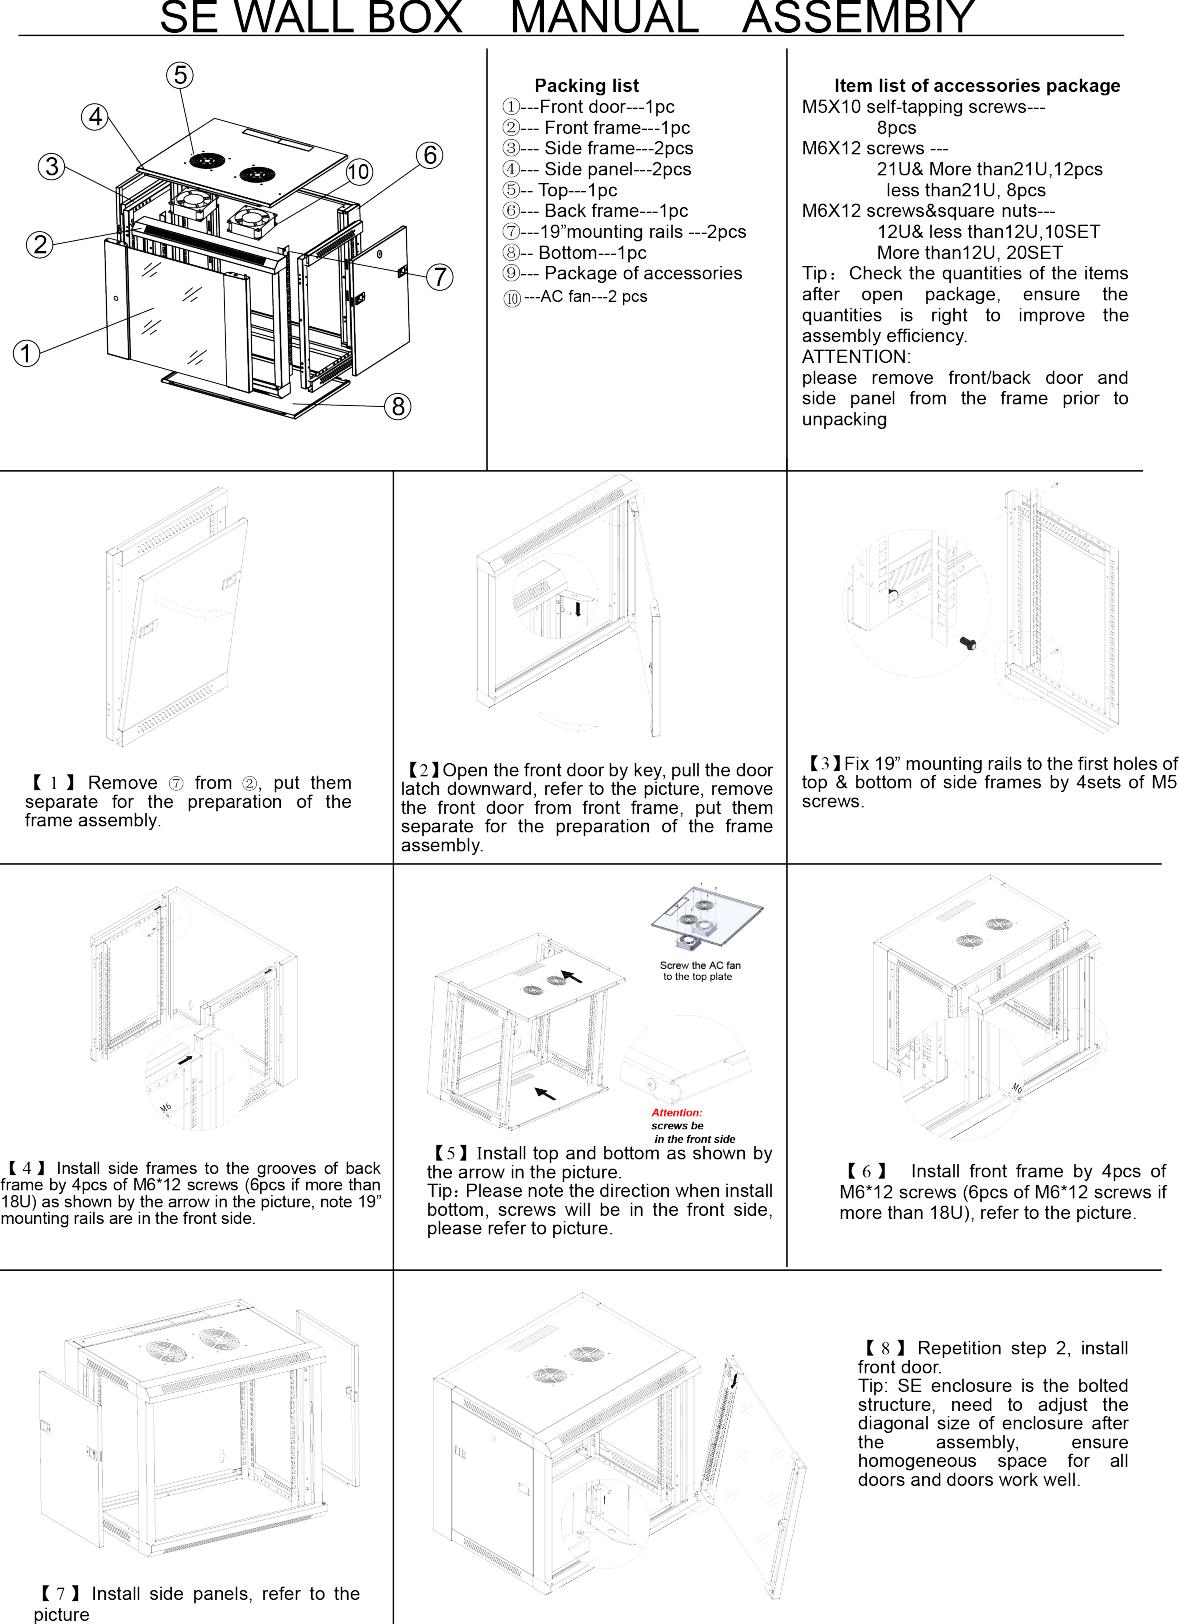 Open Rails Manual